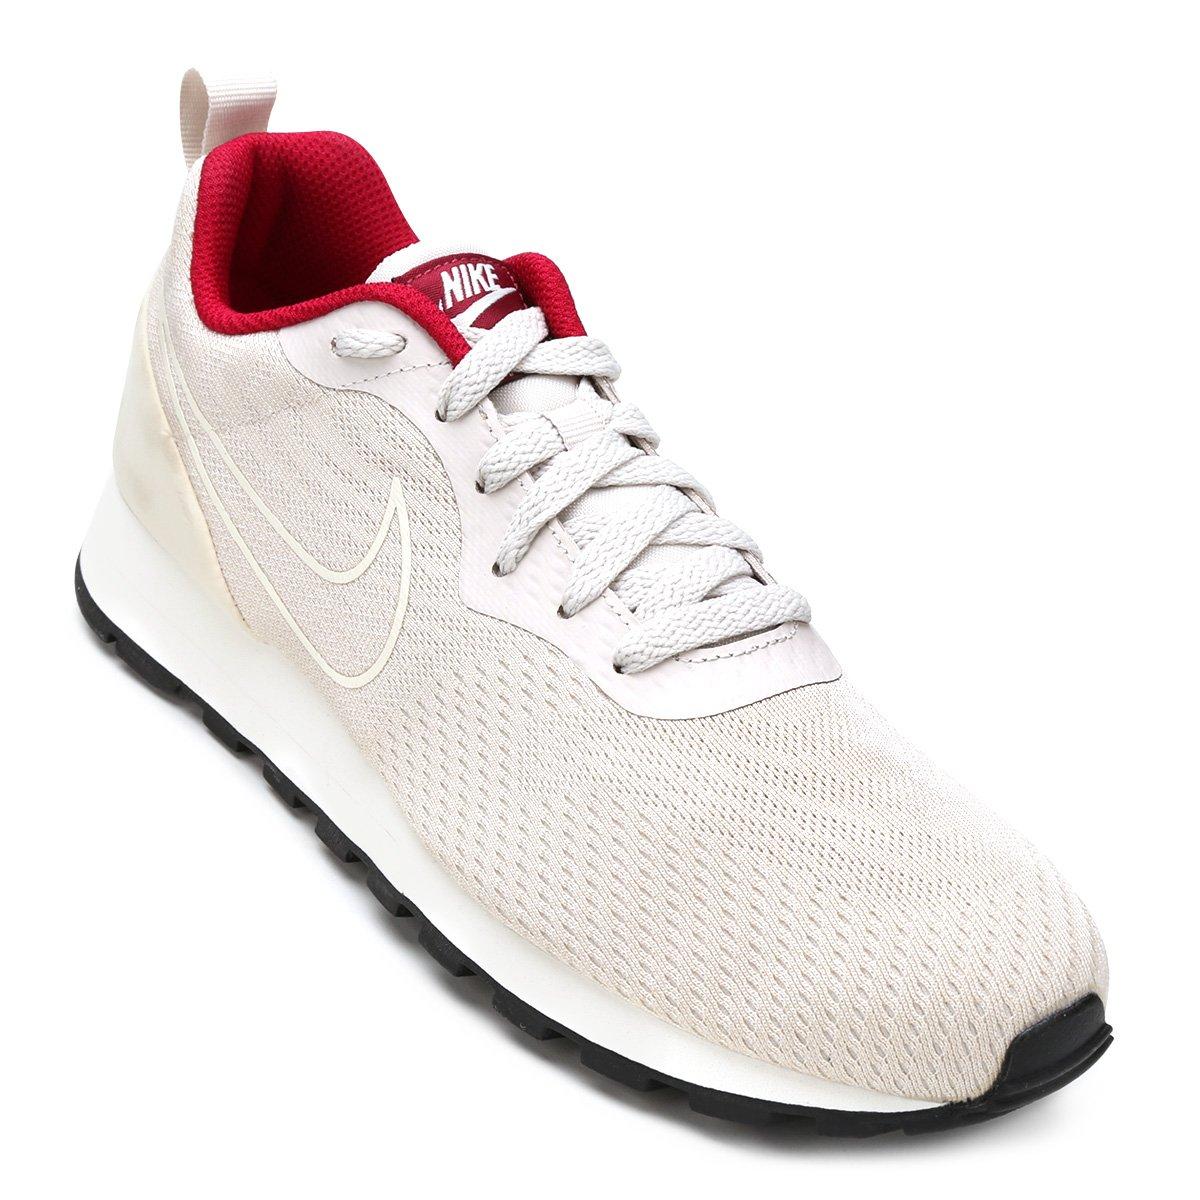 2ff63be007 Tênis Nike Md Runner 2 Eng Mesh Feminino - Gelo e Vermelho - Compre ...